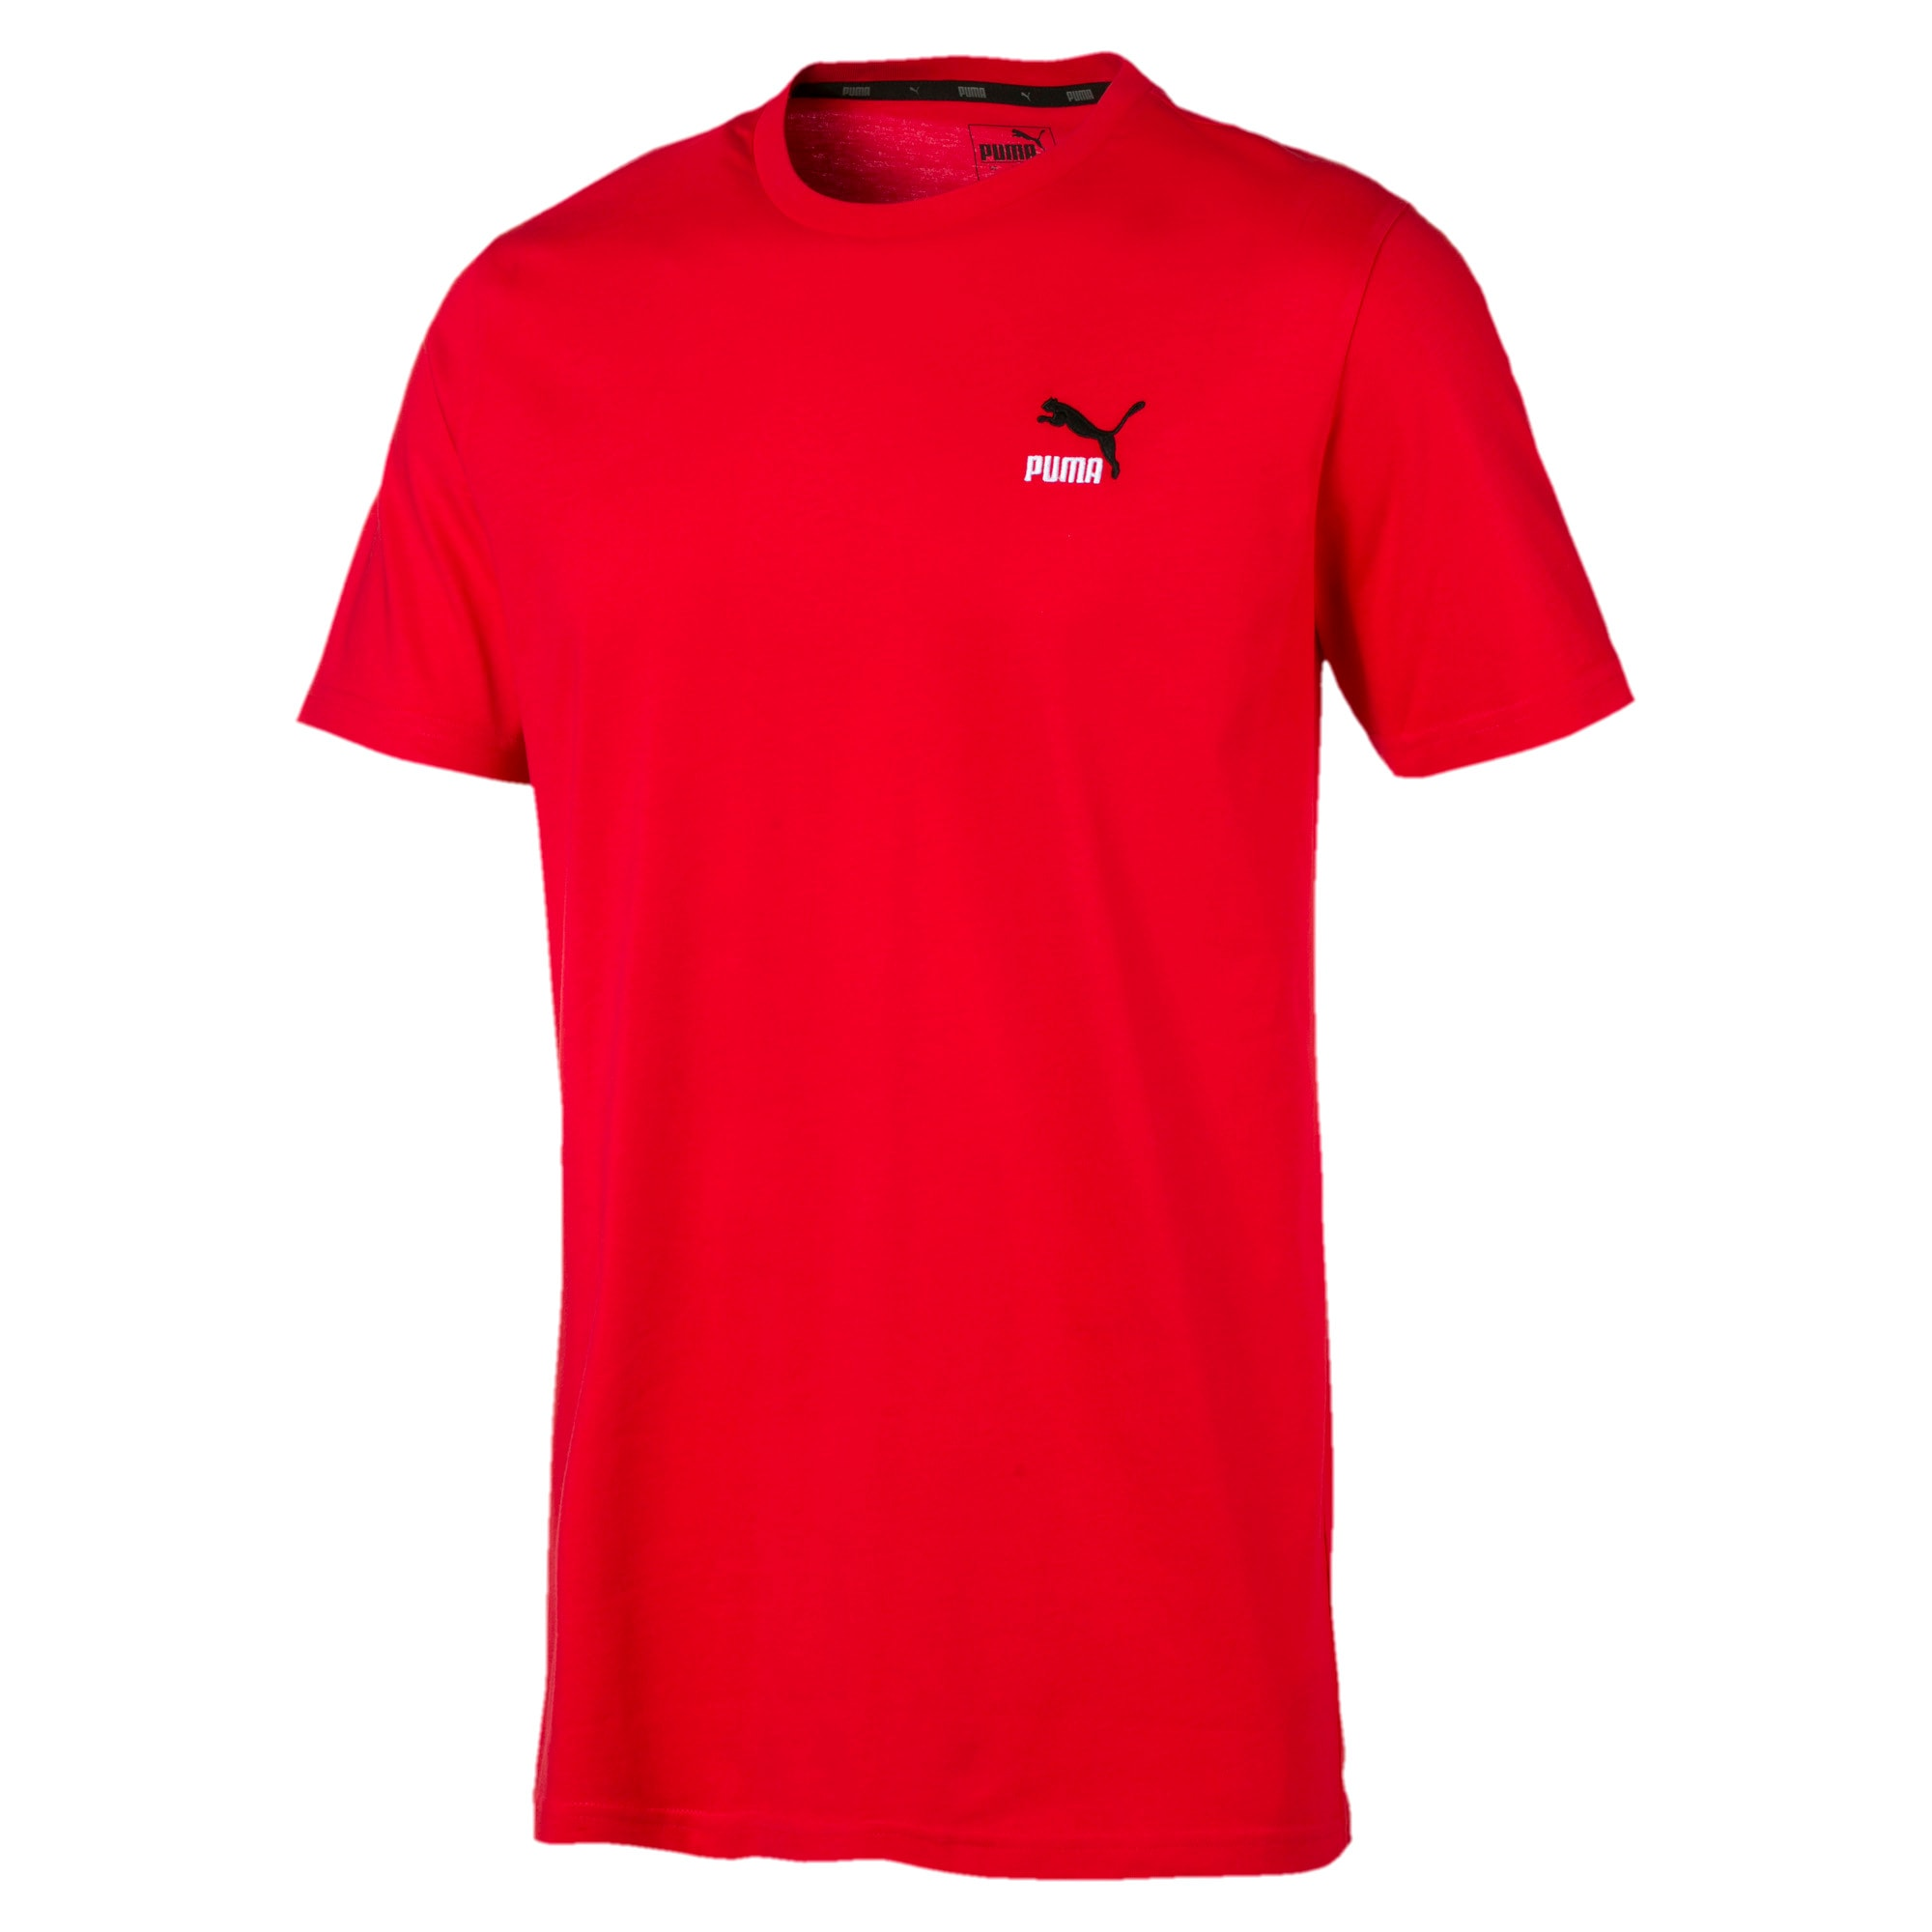 Thumbnail 1 of Classics T-shirt met borduursel voor heren, High Risk Red, medium